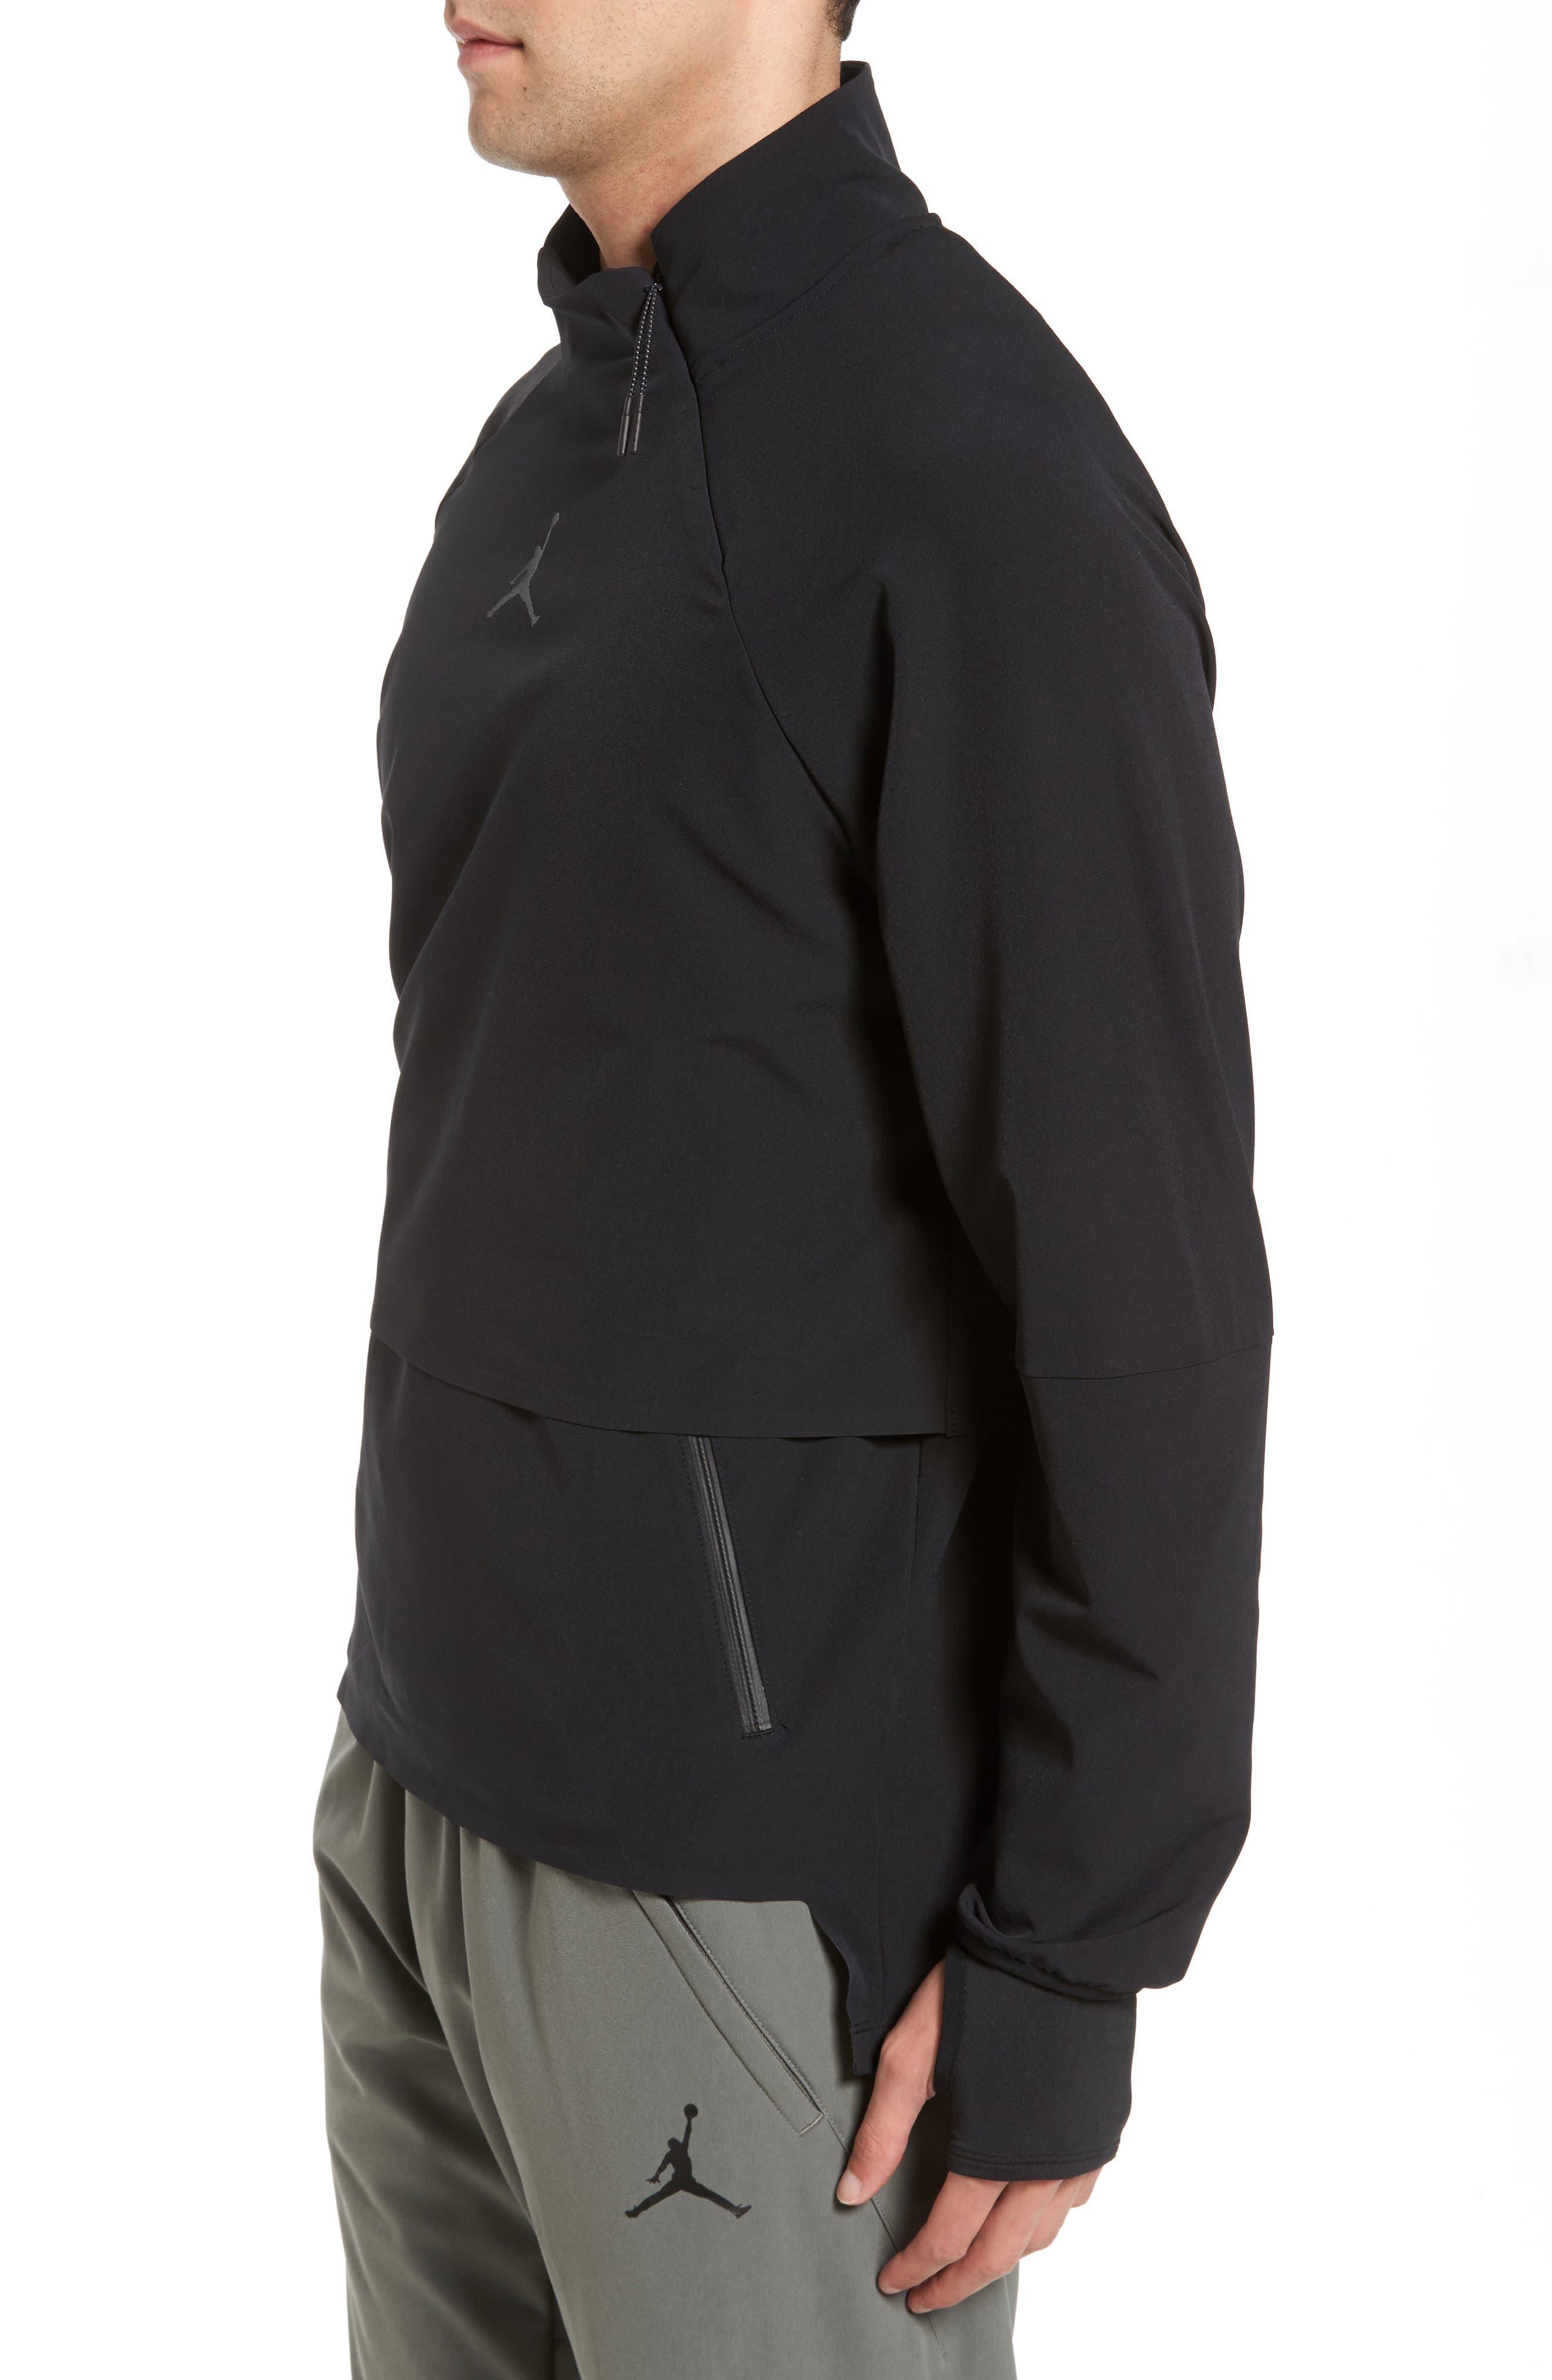 Nike Jordan 23 Tech Shield Jacket,                             Alternate thumbnail 3, color,                             010